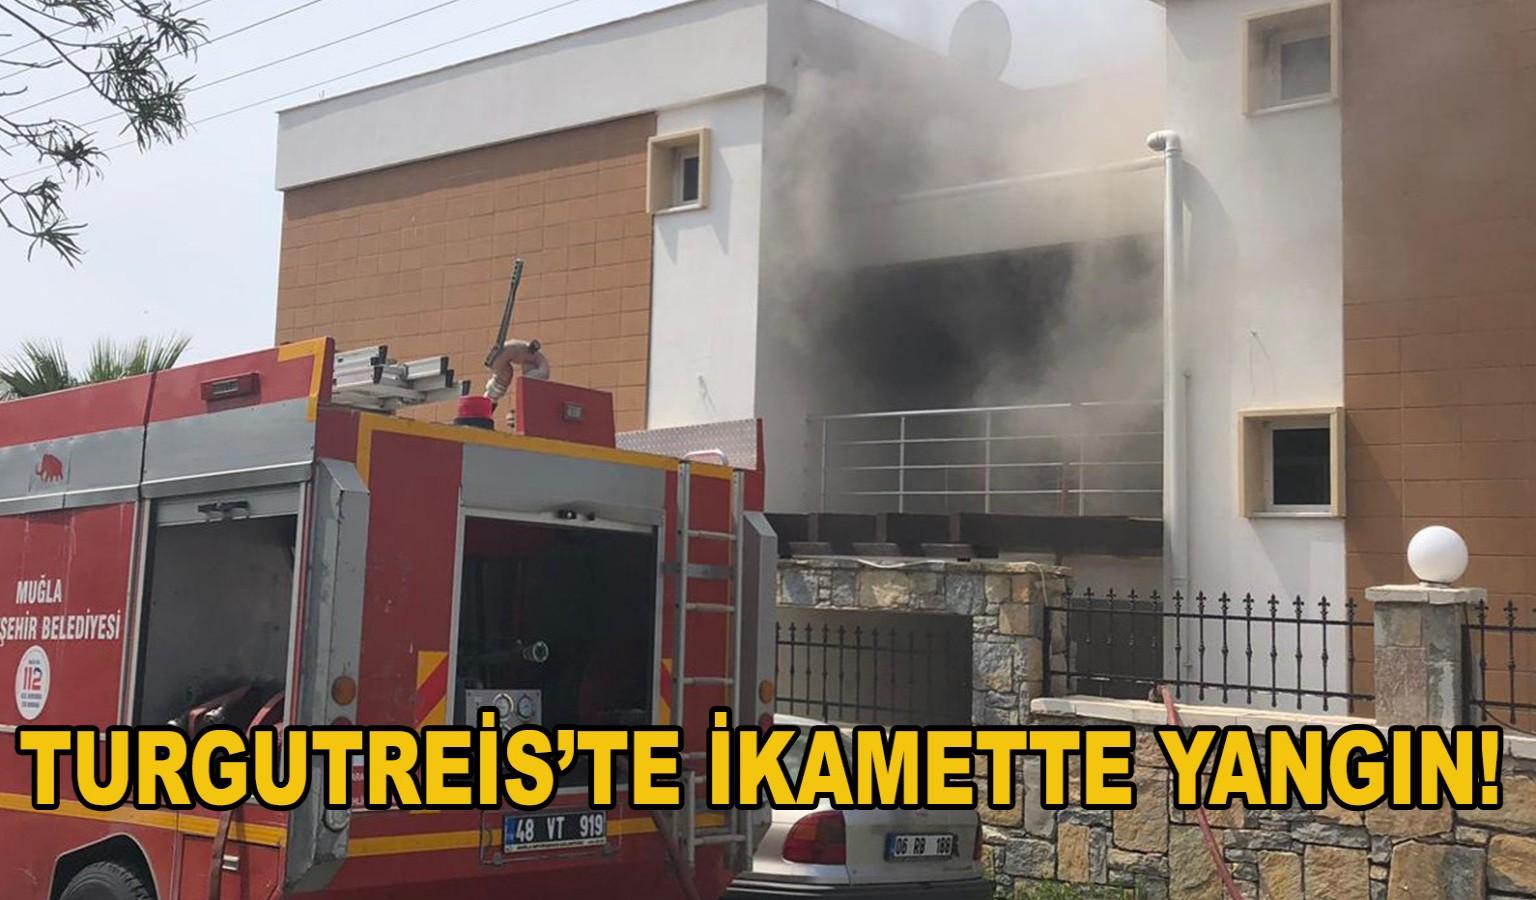 TURGUTREİS'TE İKAMETTE YANGIN!